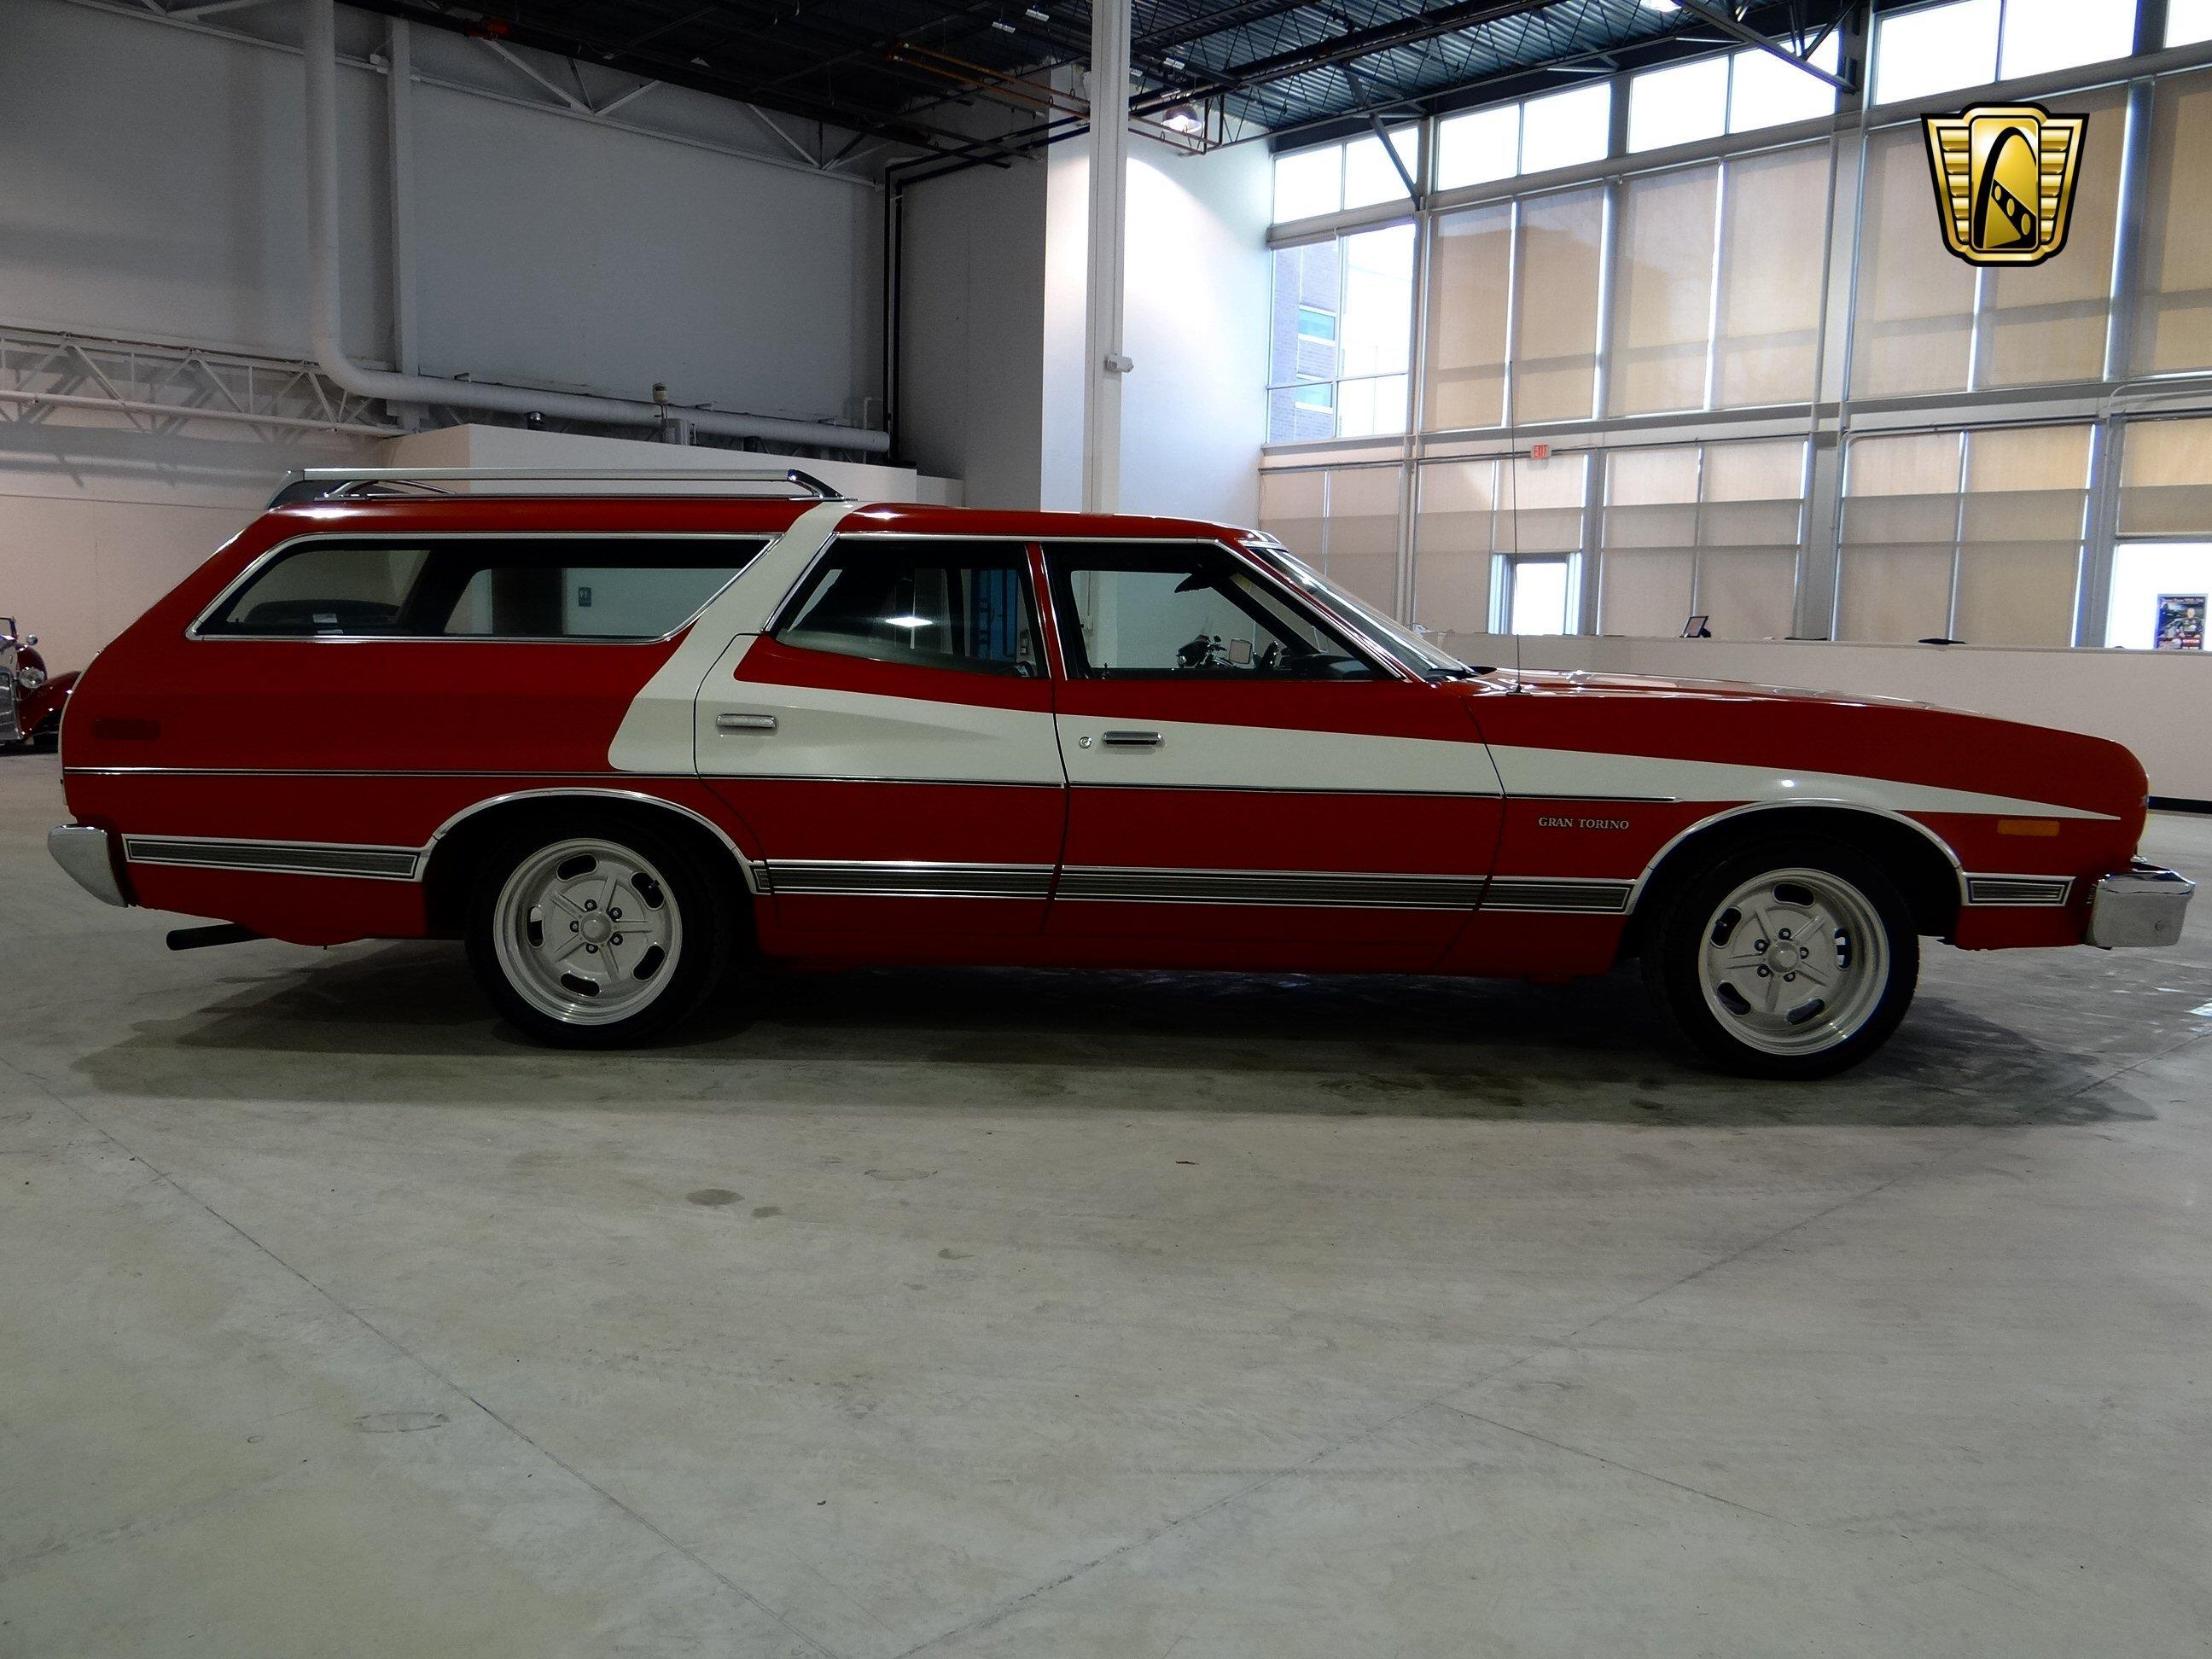 1973 Ford Gran Torino Stationwagon Muscle Classic Hot Rod